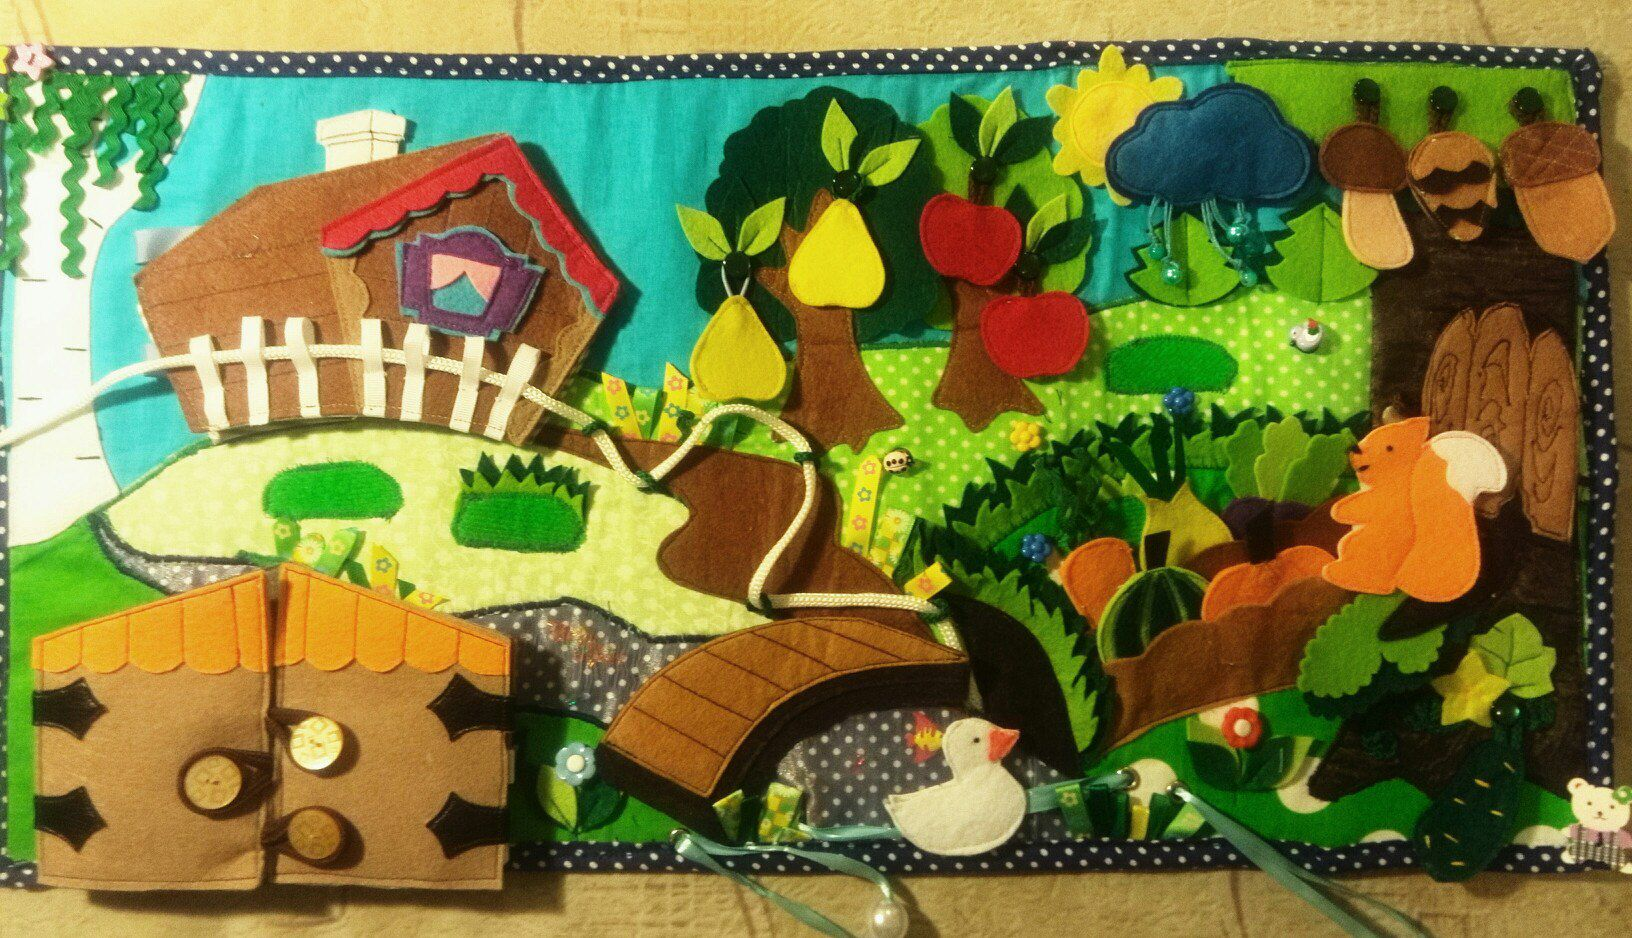 игрушки фетр развивашки малышам подароки фетрсказки